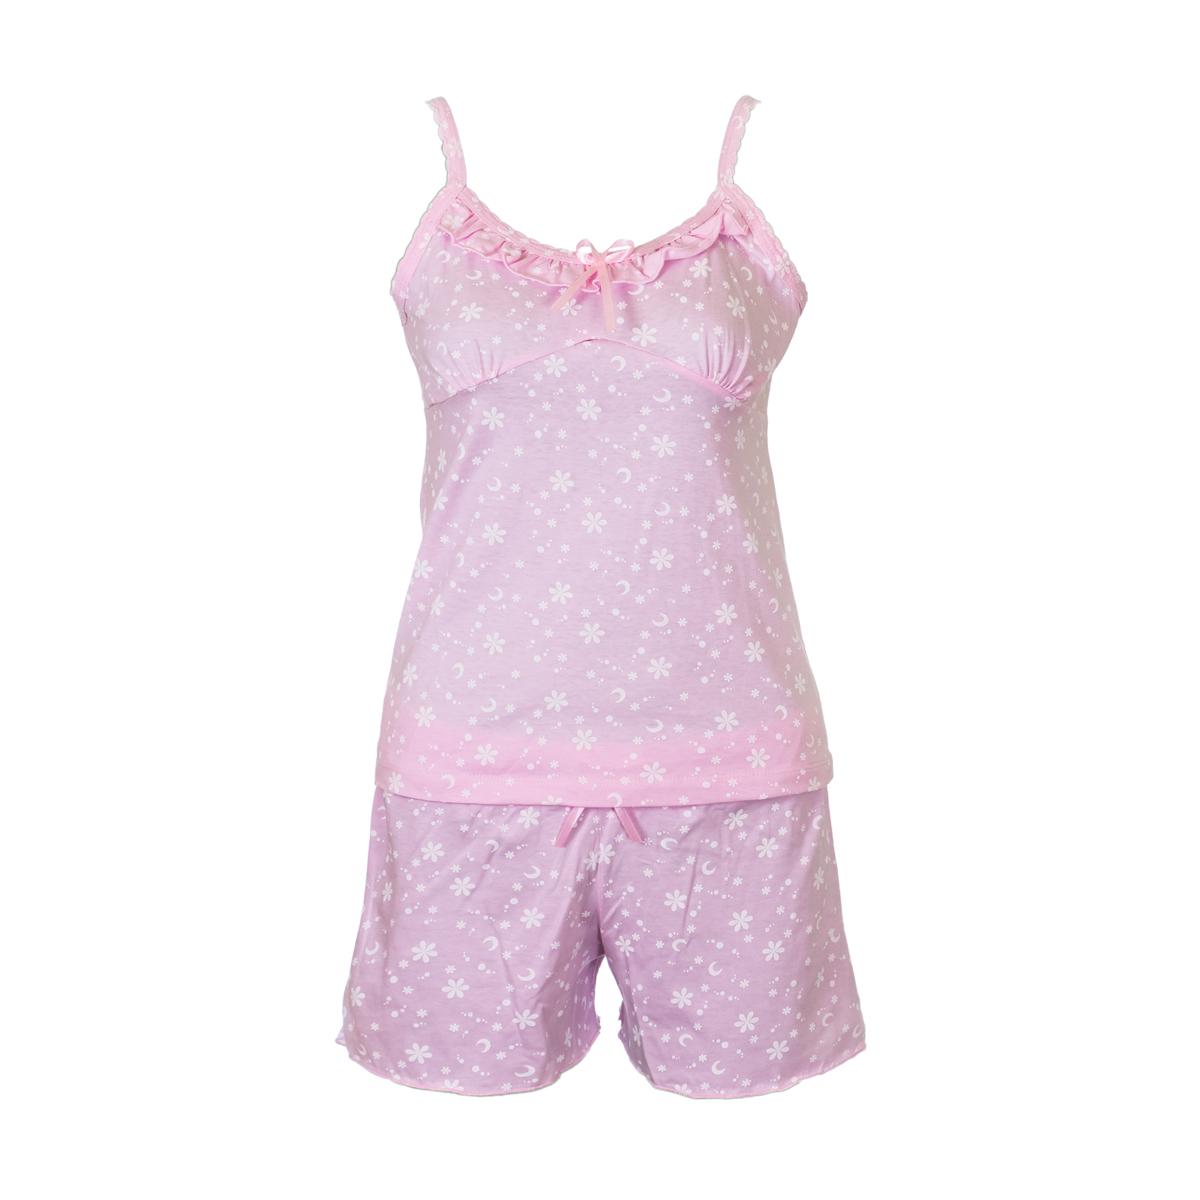 Жен. пижама арт. 04-0064 Розовый р. 52 - Женская одежда артикул: 26390